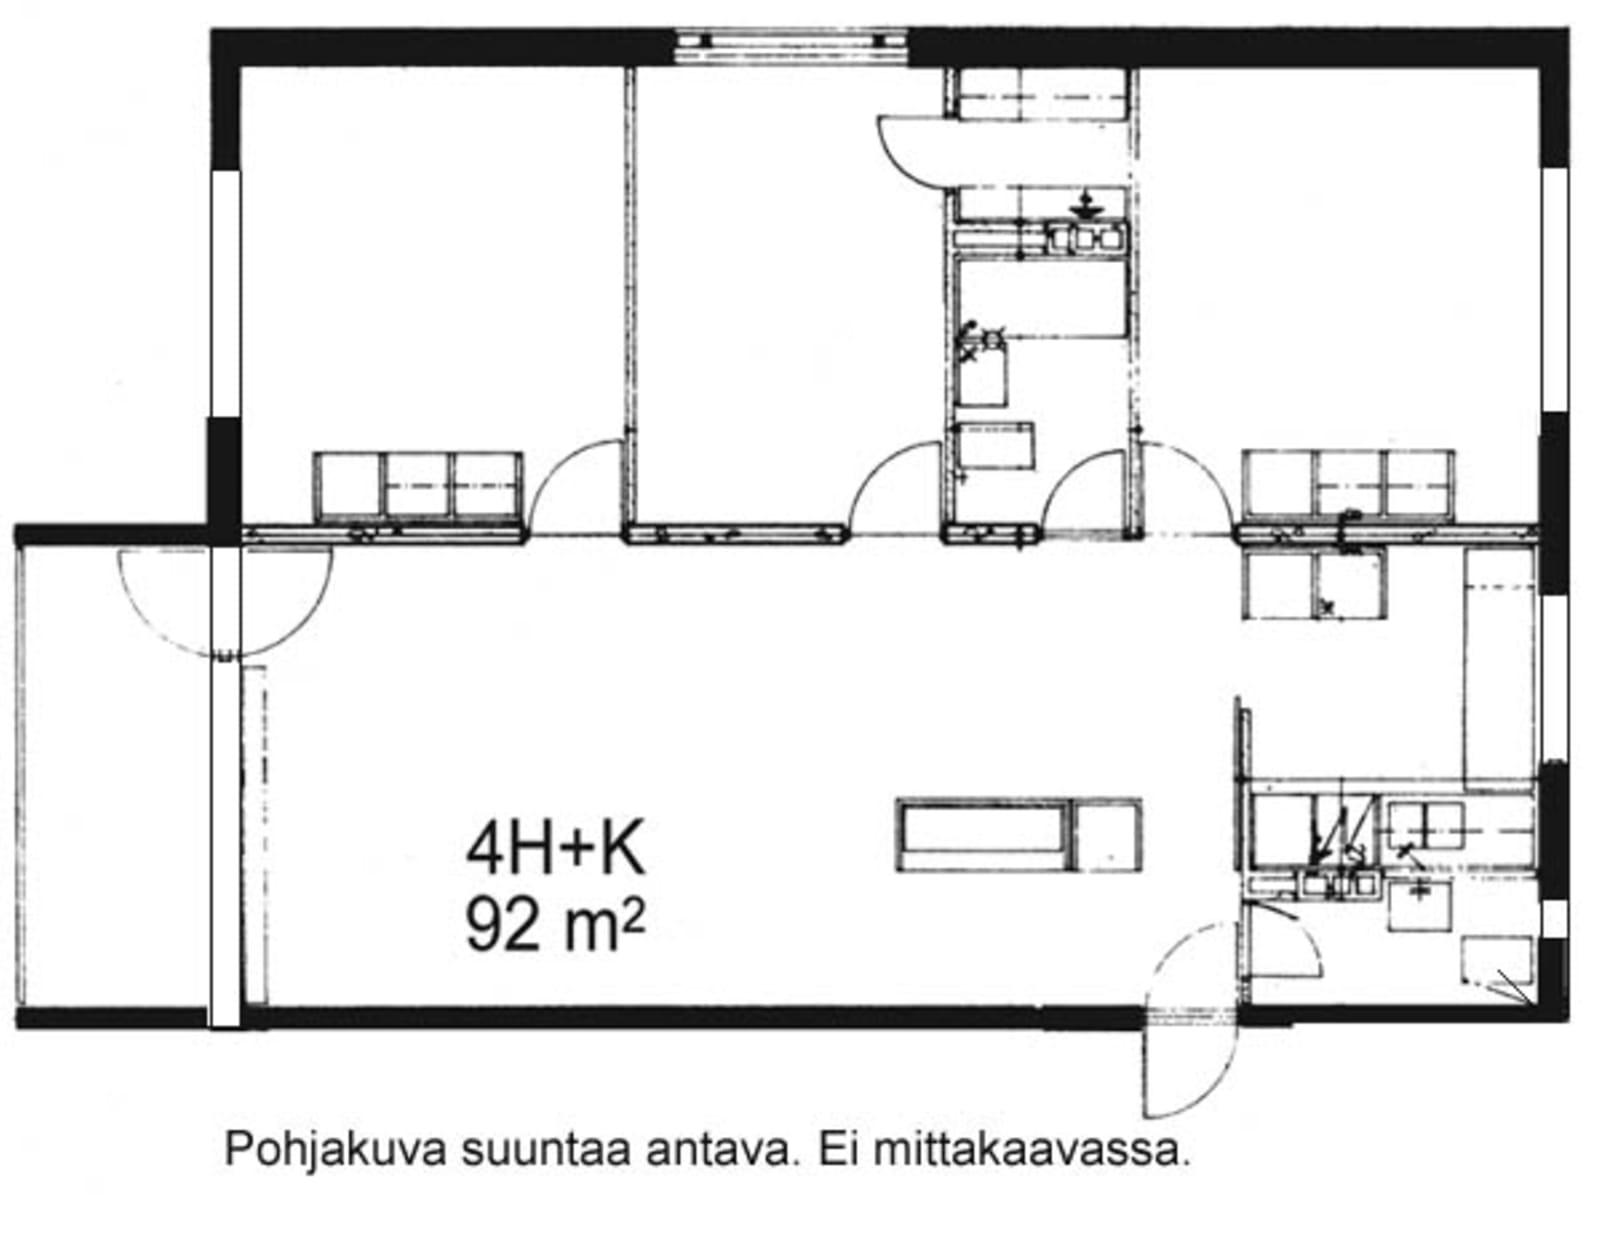 Oulu, Kaukovainio, Tuulihaukantie 9 A 014